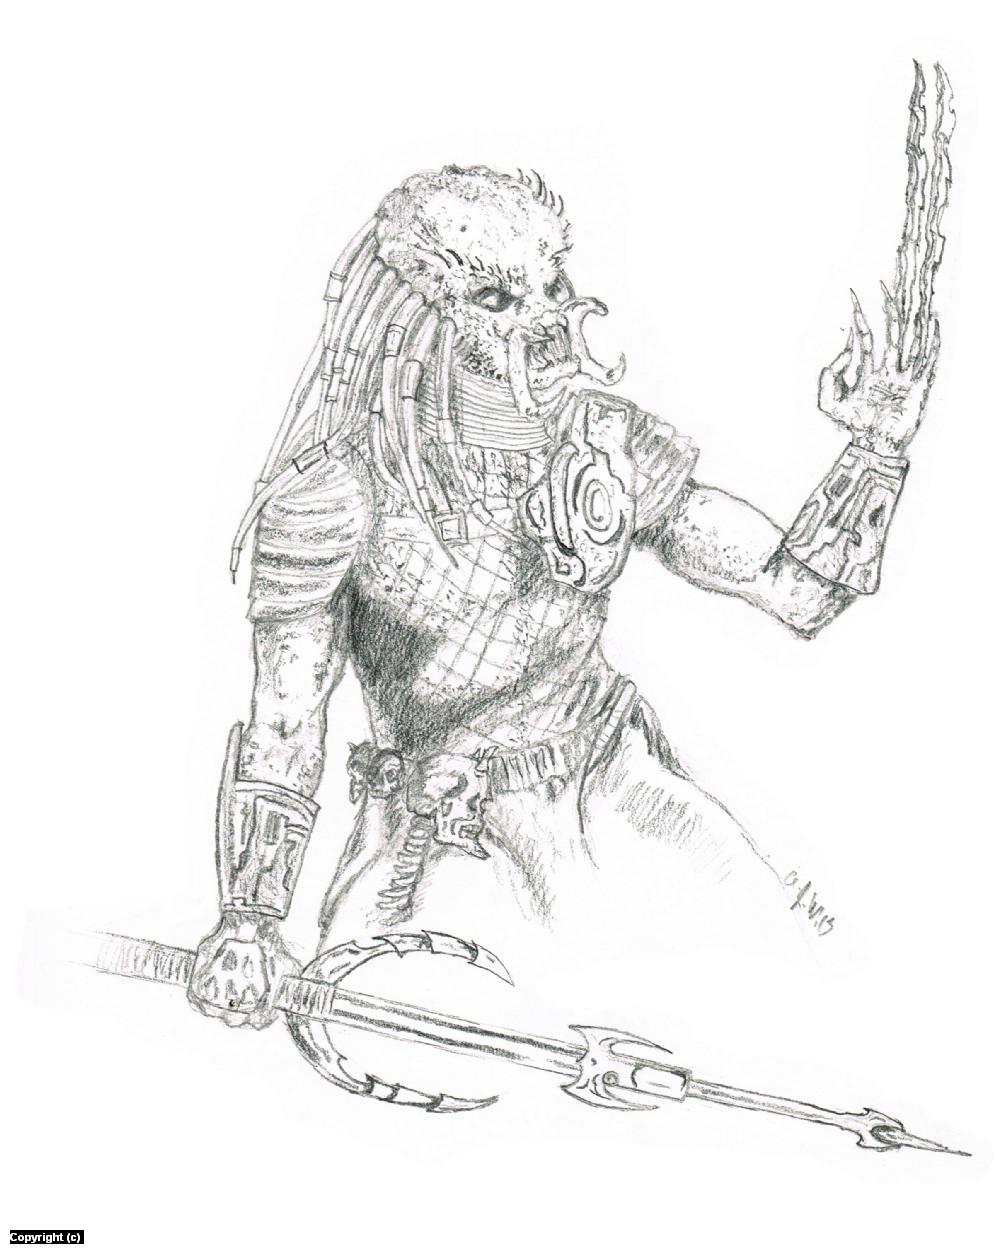 Predator Artwork by A. Jaye Williams